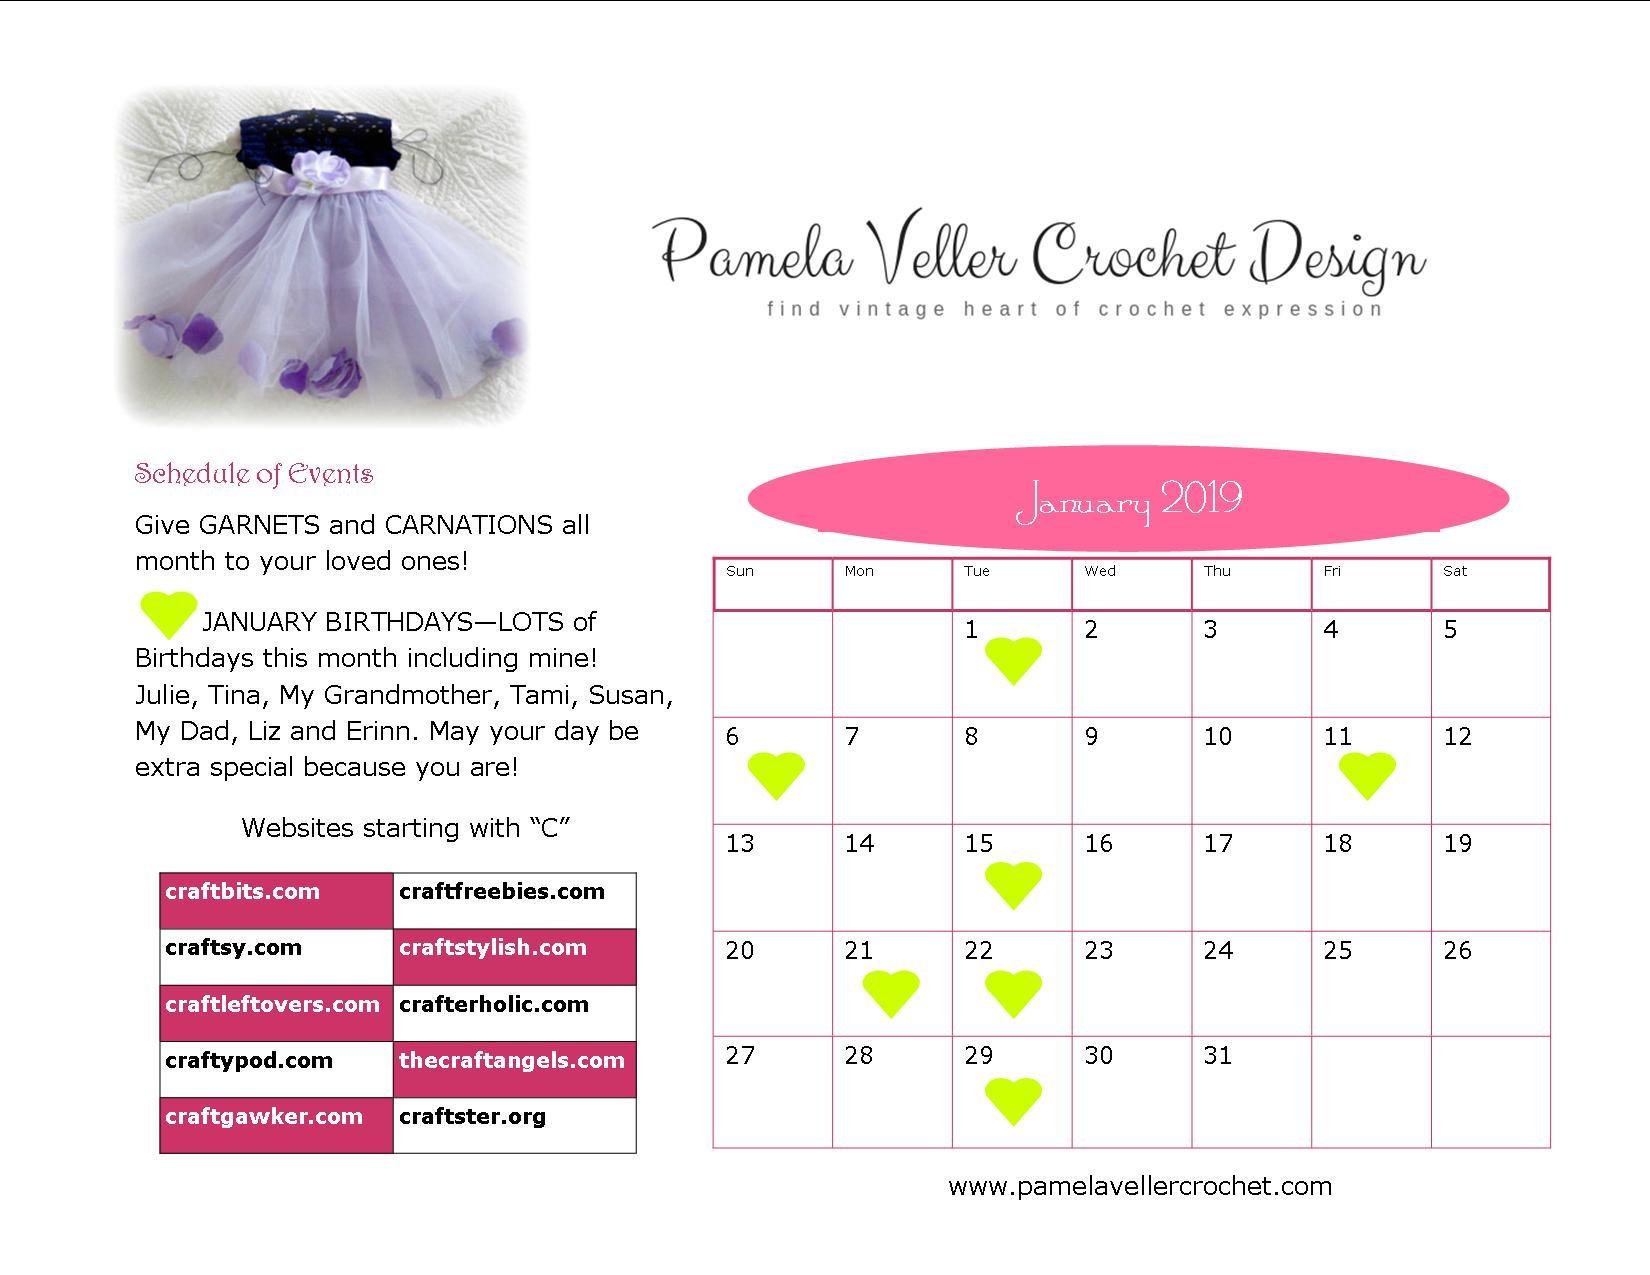 10 Great Craft Websites Pamela Veller Crochet Design